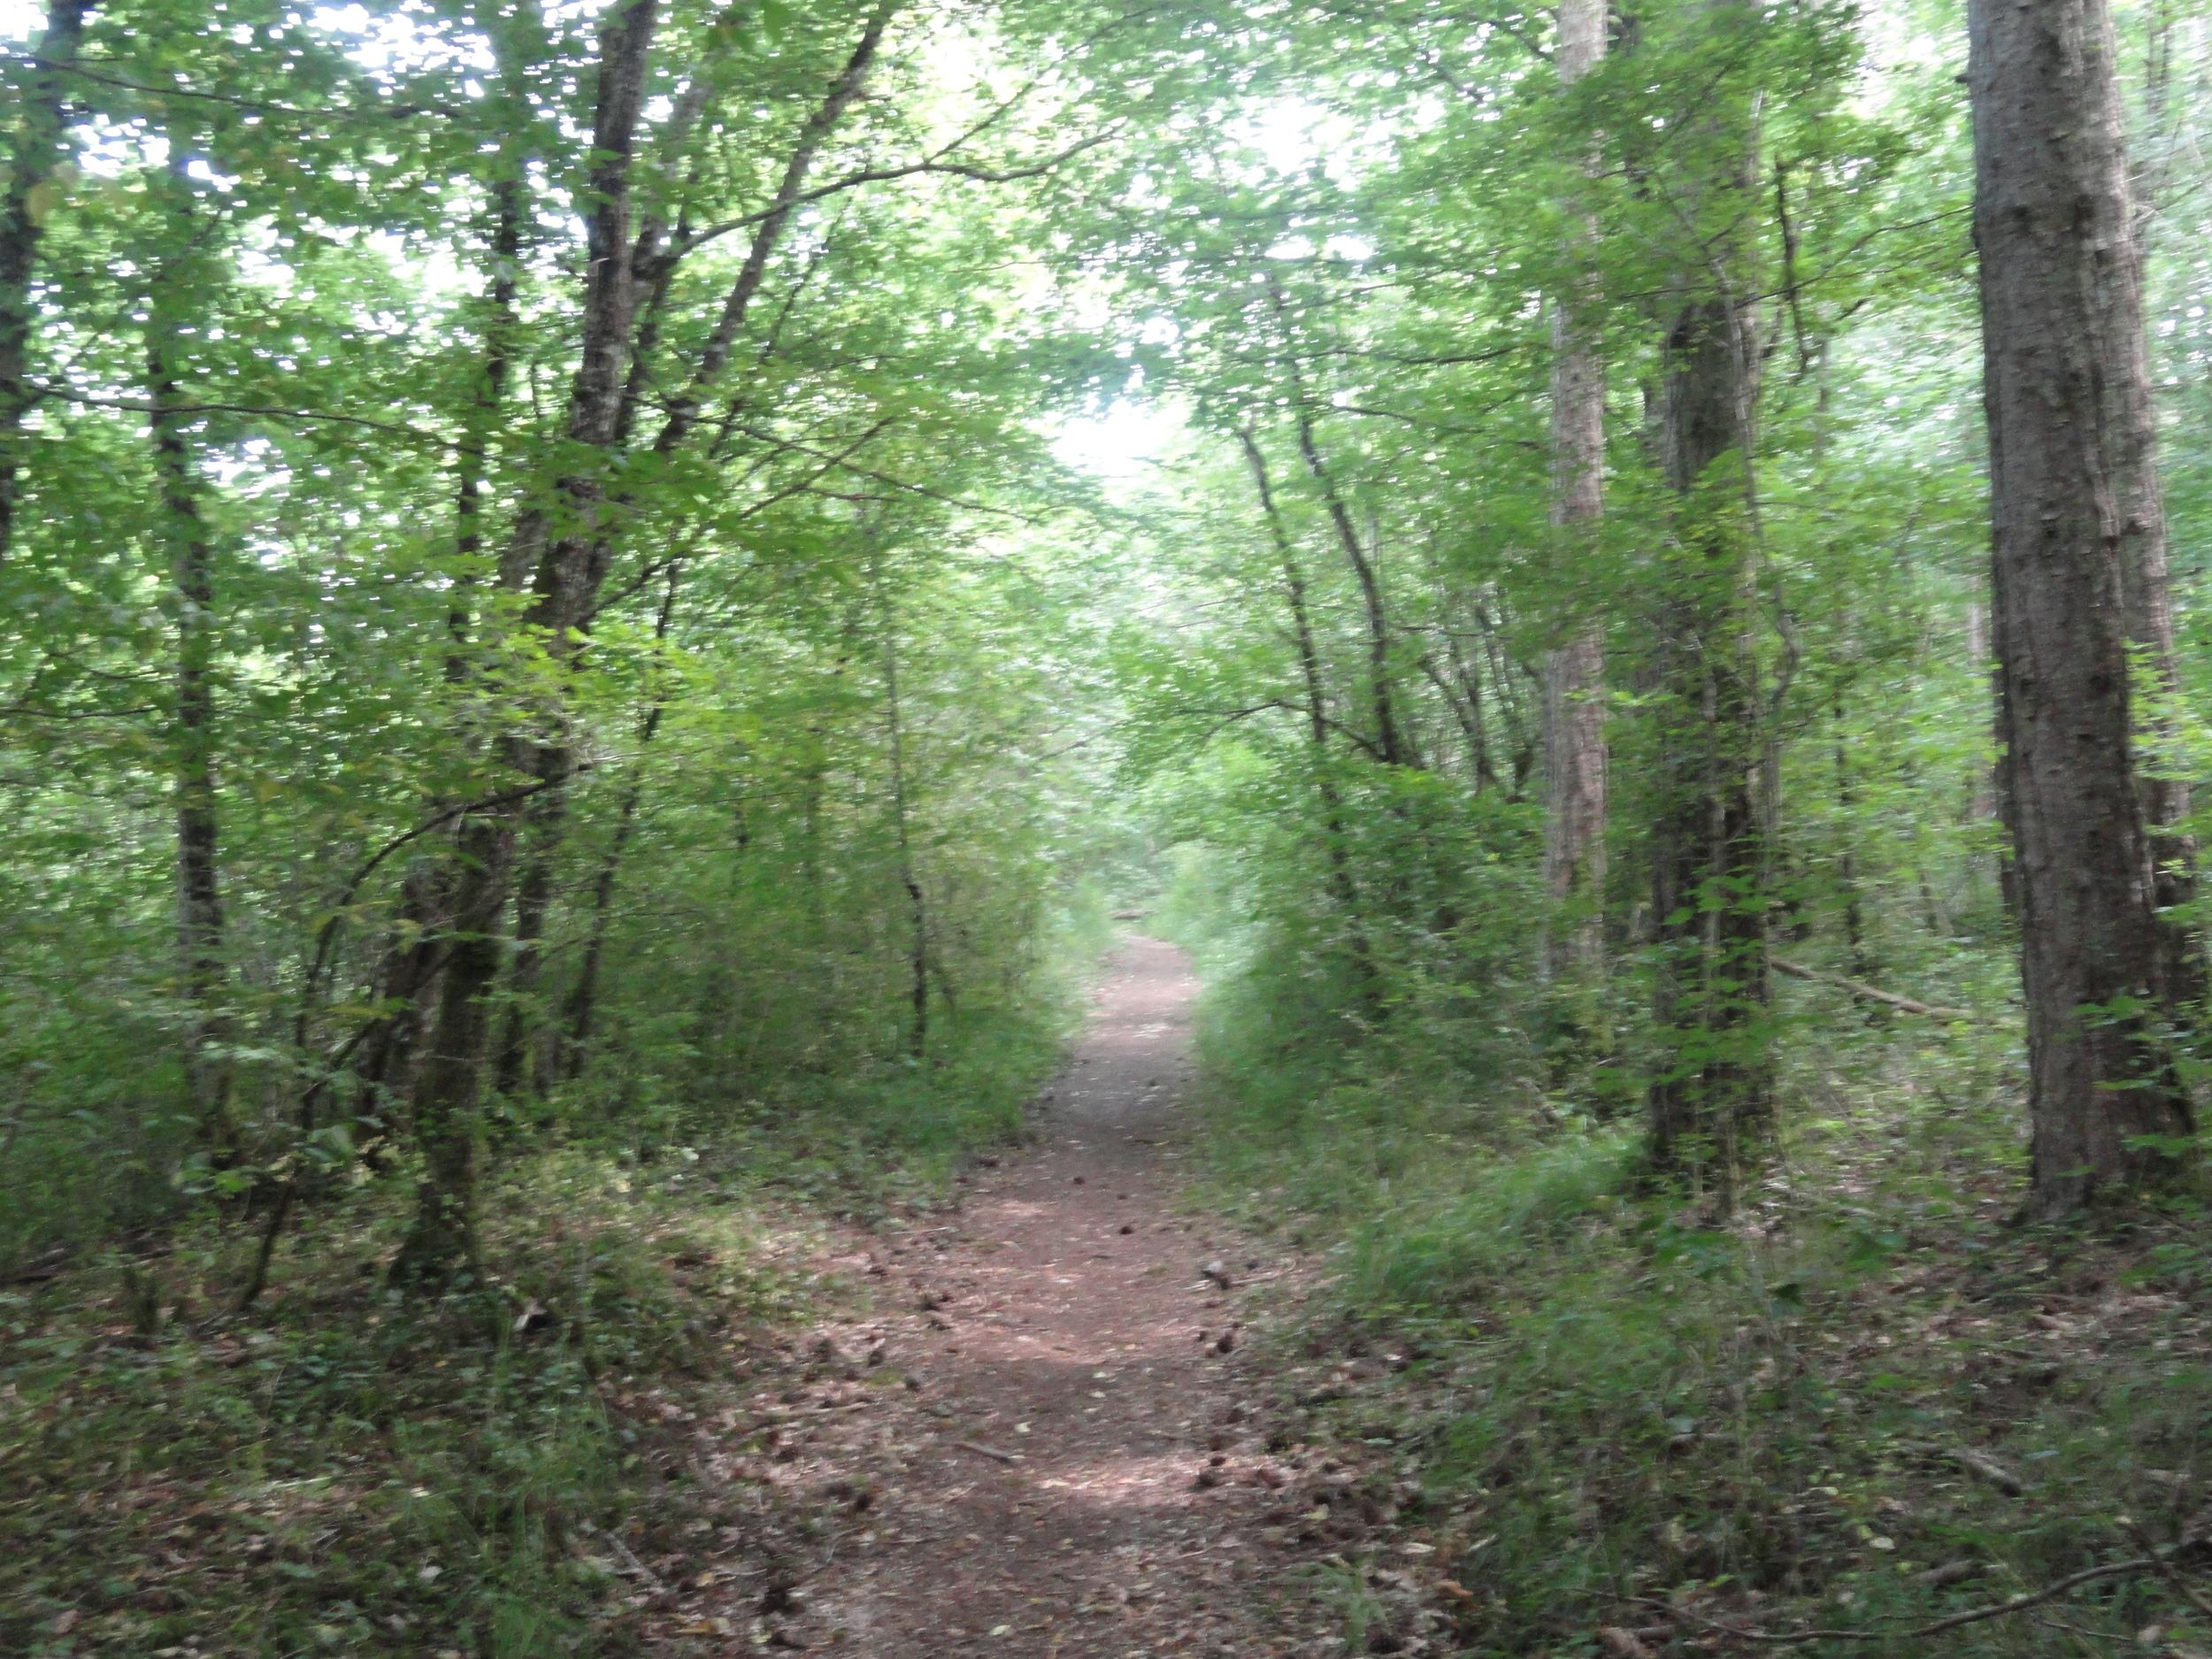 More Effing Forest